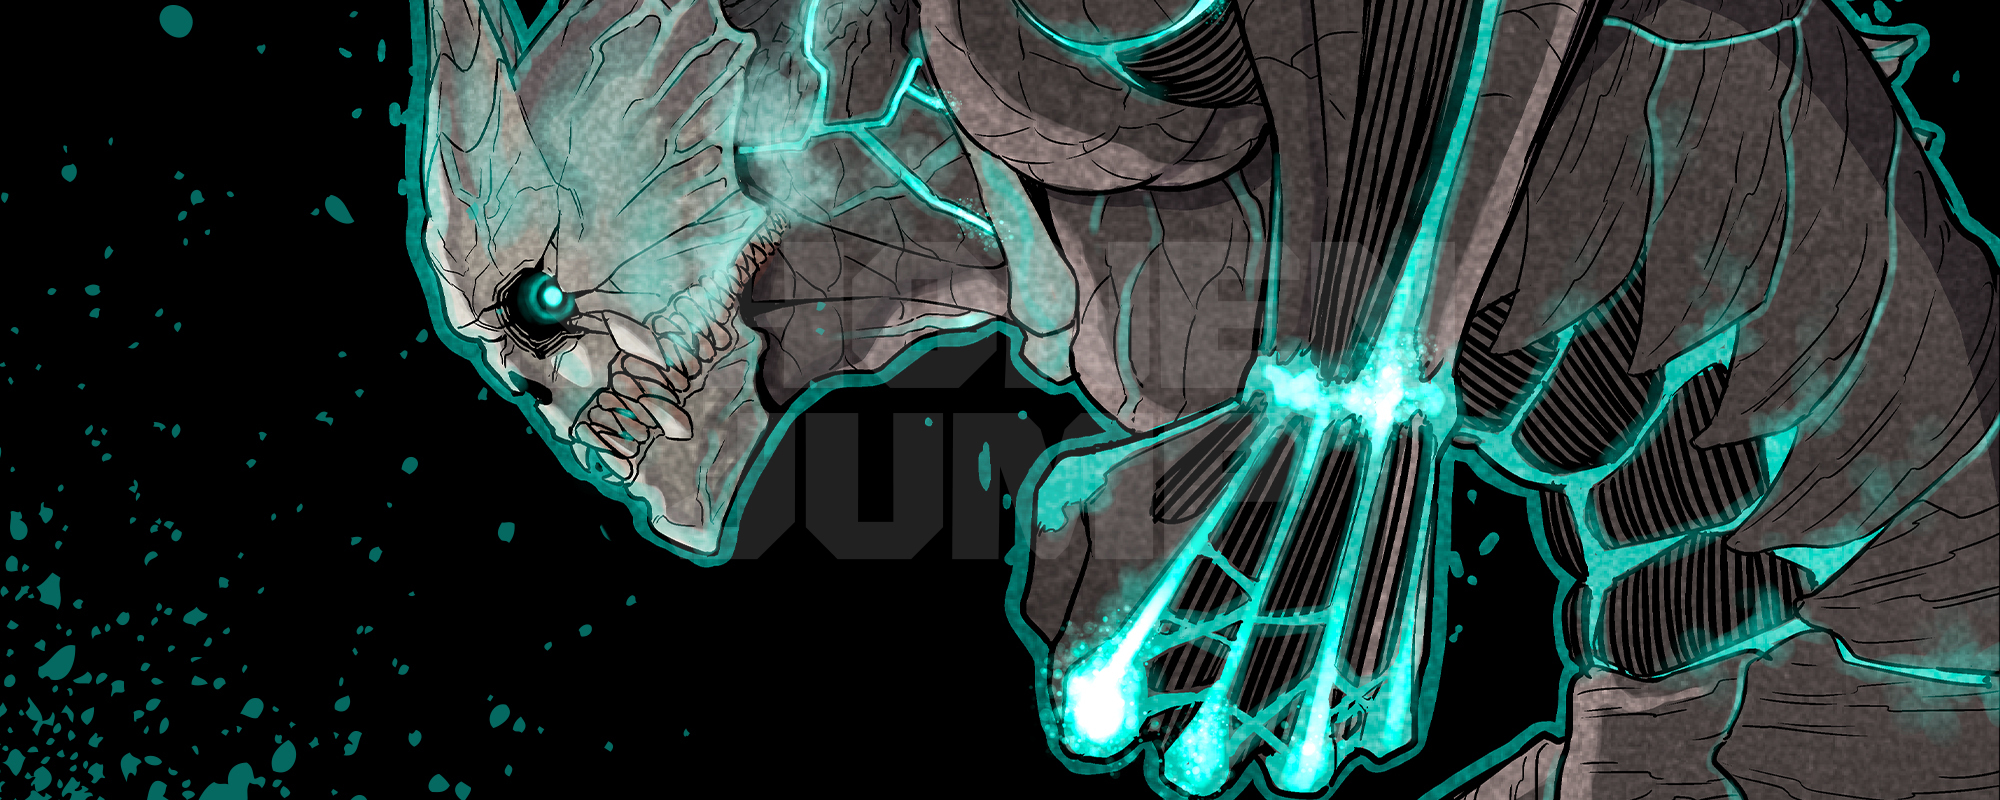 Kaiju No 8 Chapter 37